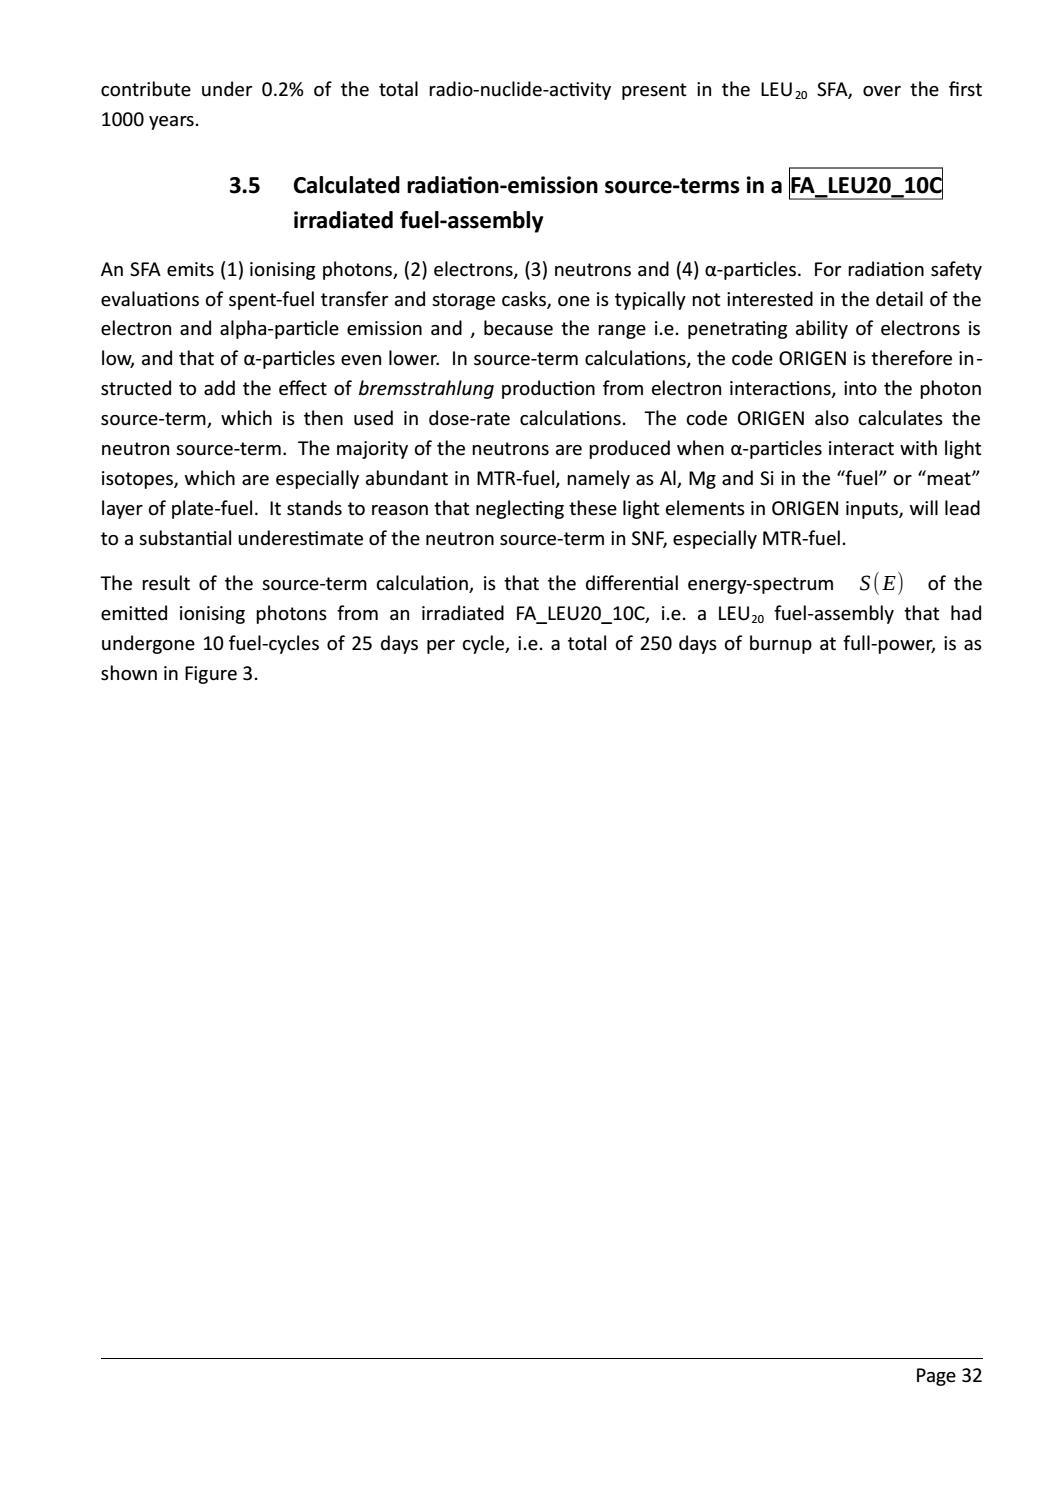 RADIOACTIVE WASTE: COMPUTATIONAL CHARACTERISATION and SHIELDING page 57